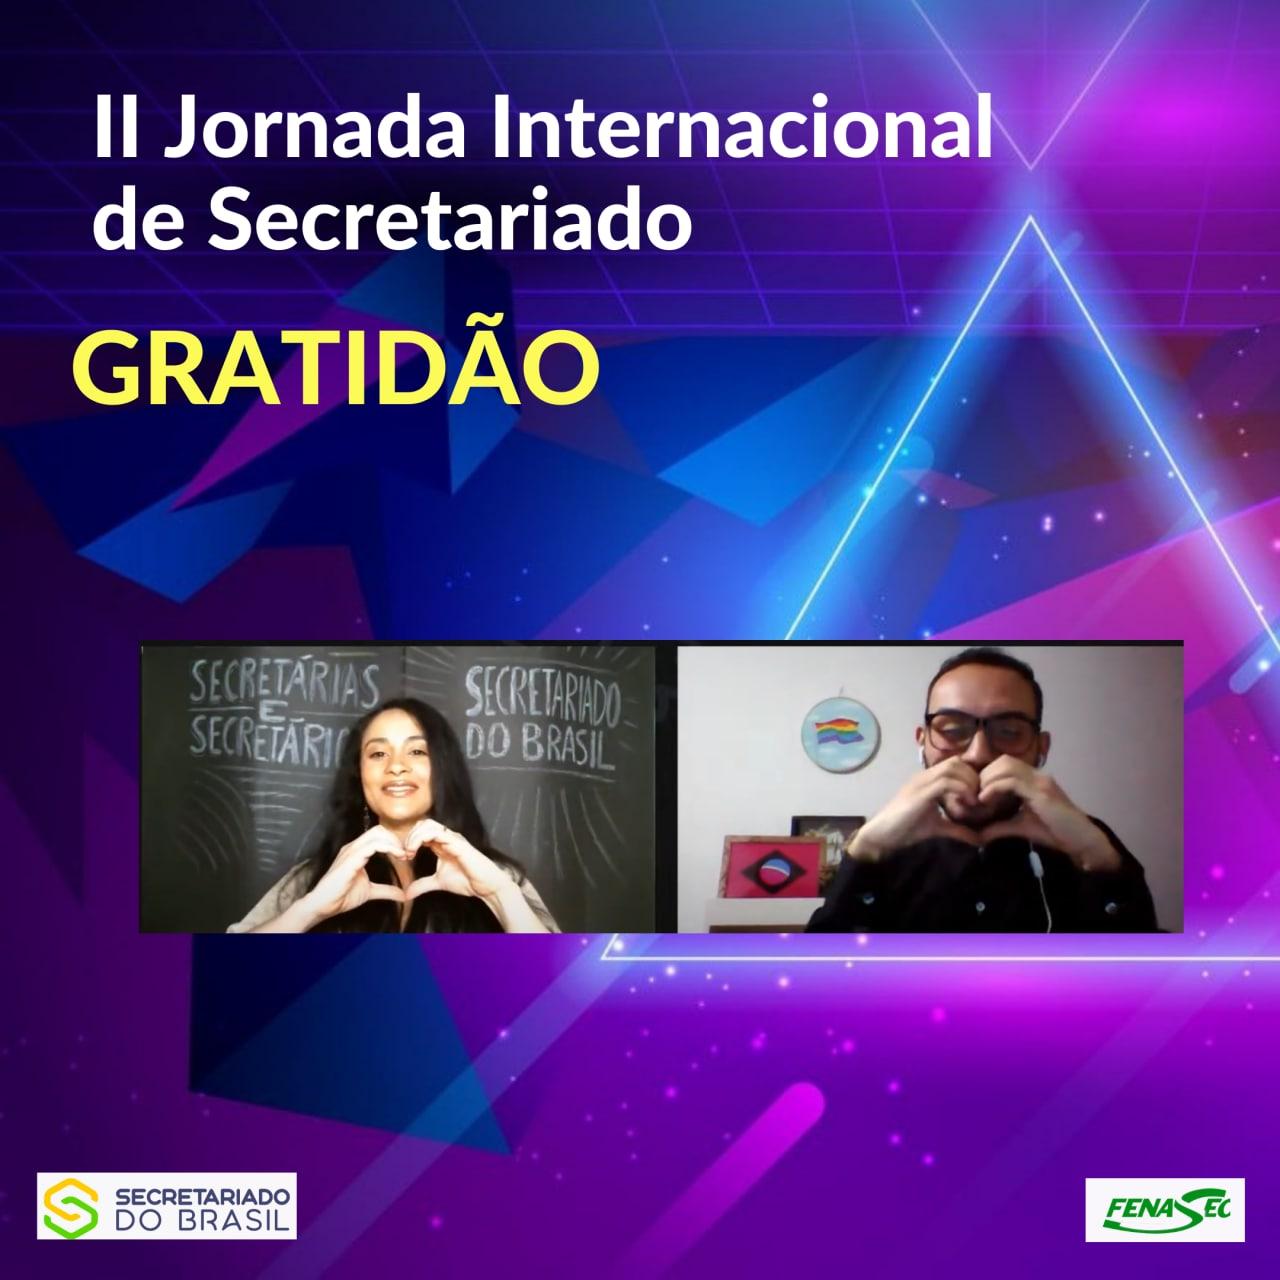 II_jornada_internacional_de_secretariado_dia_3_